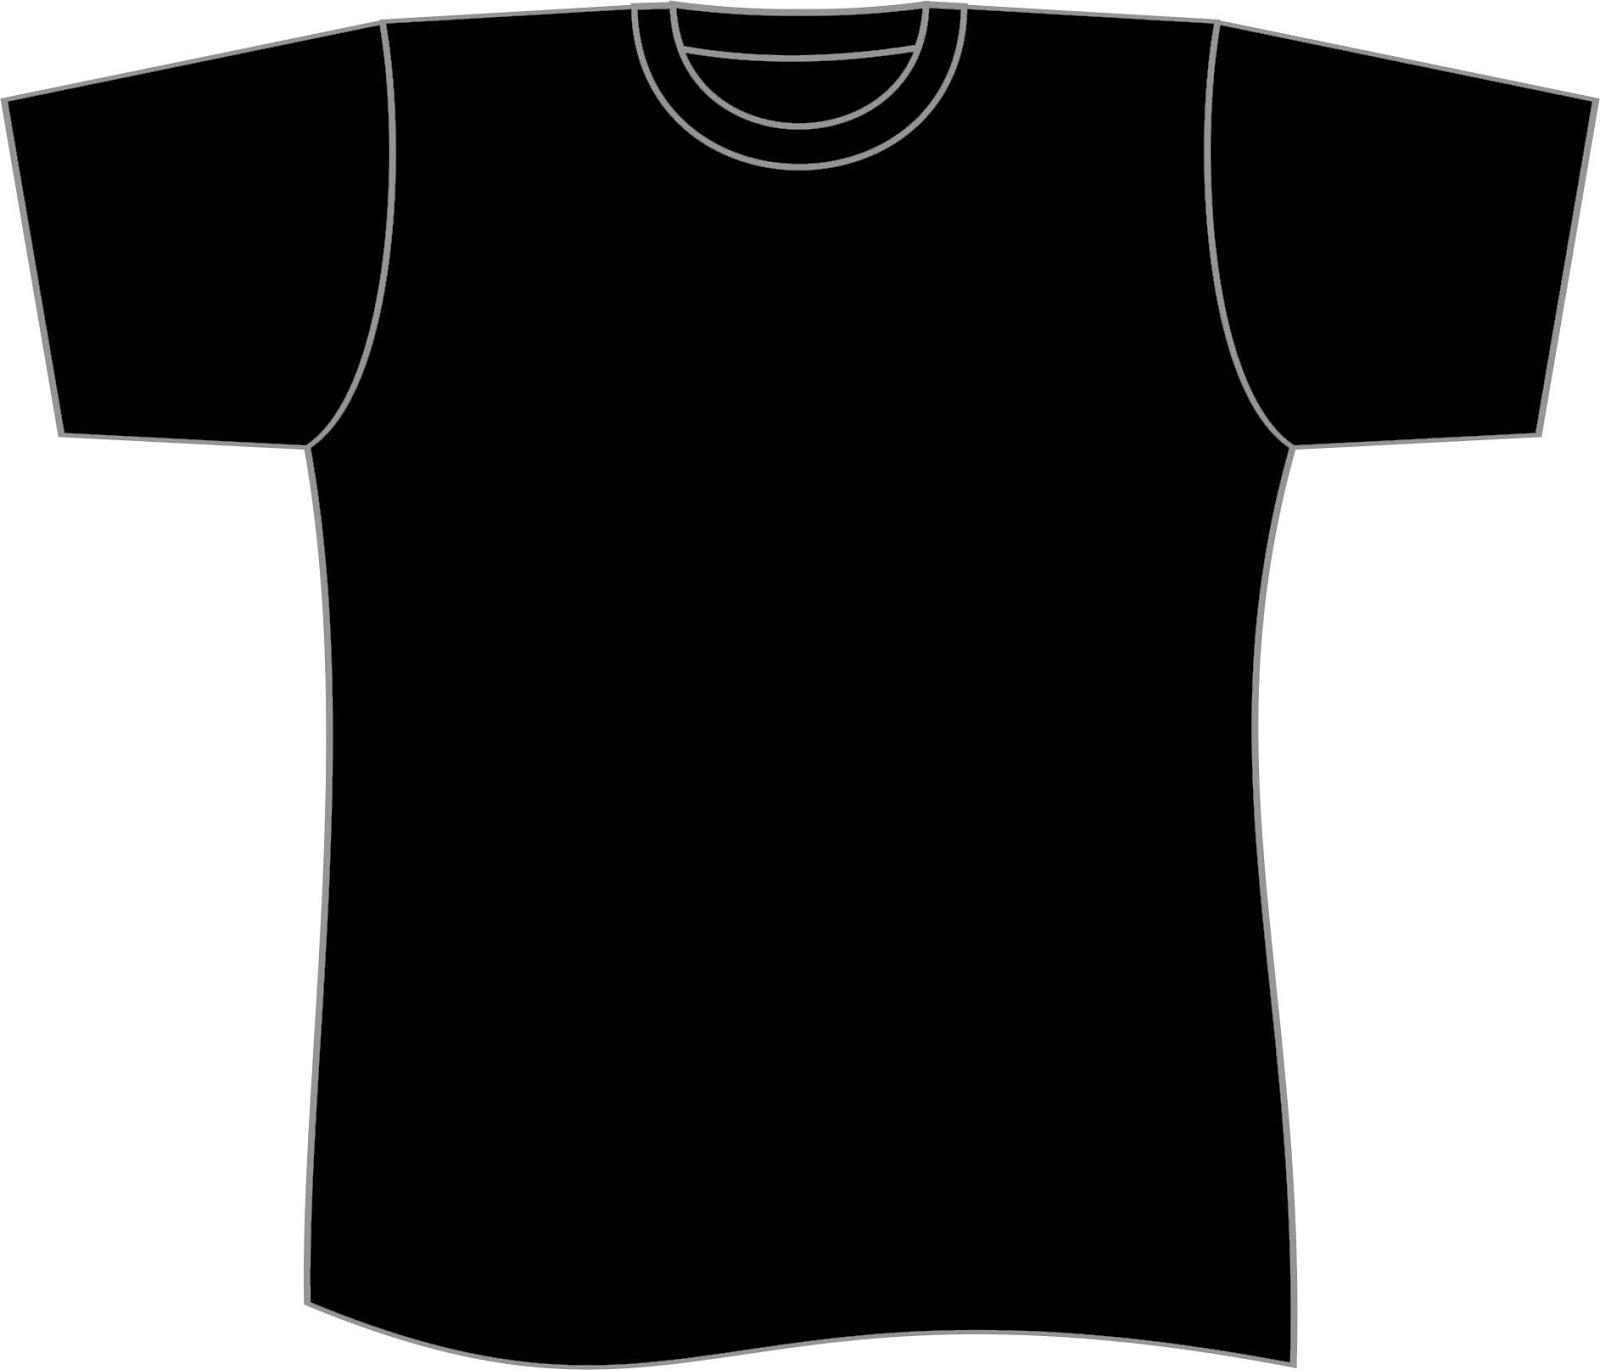 Plain Black T Shirt Clipart.